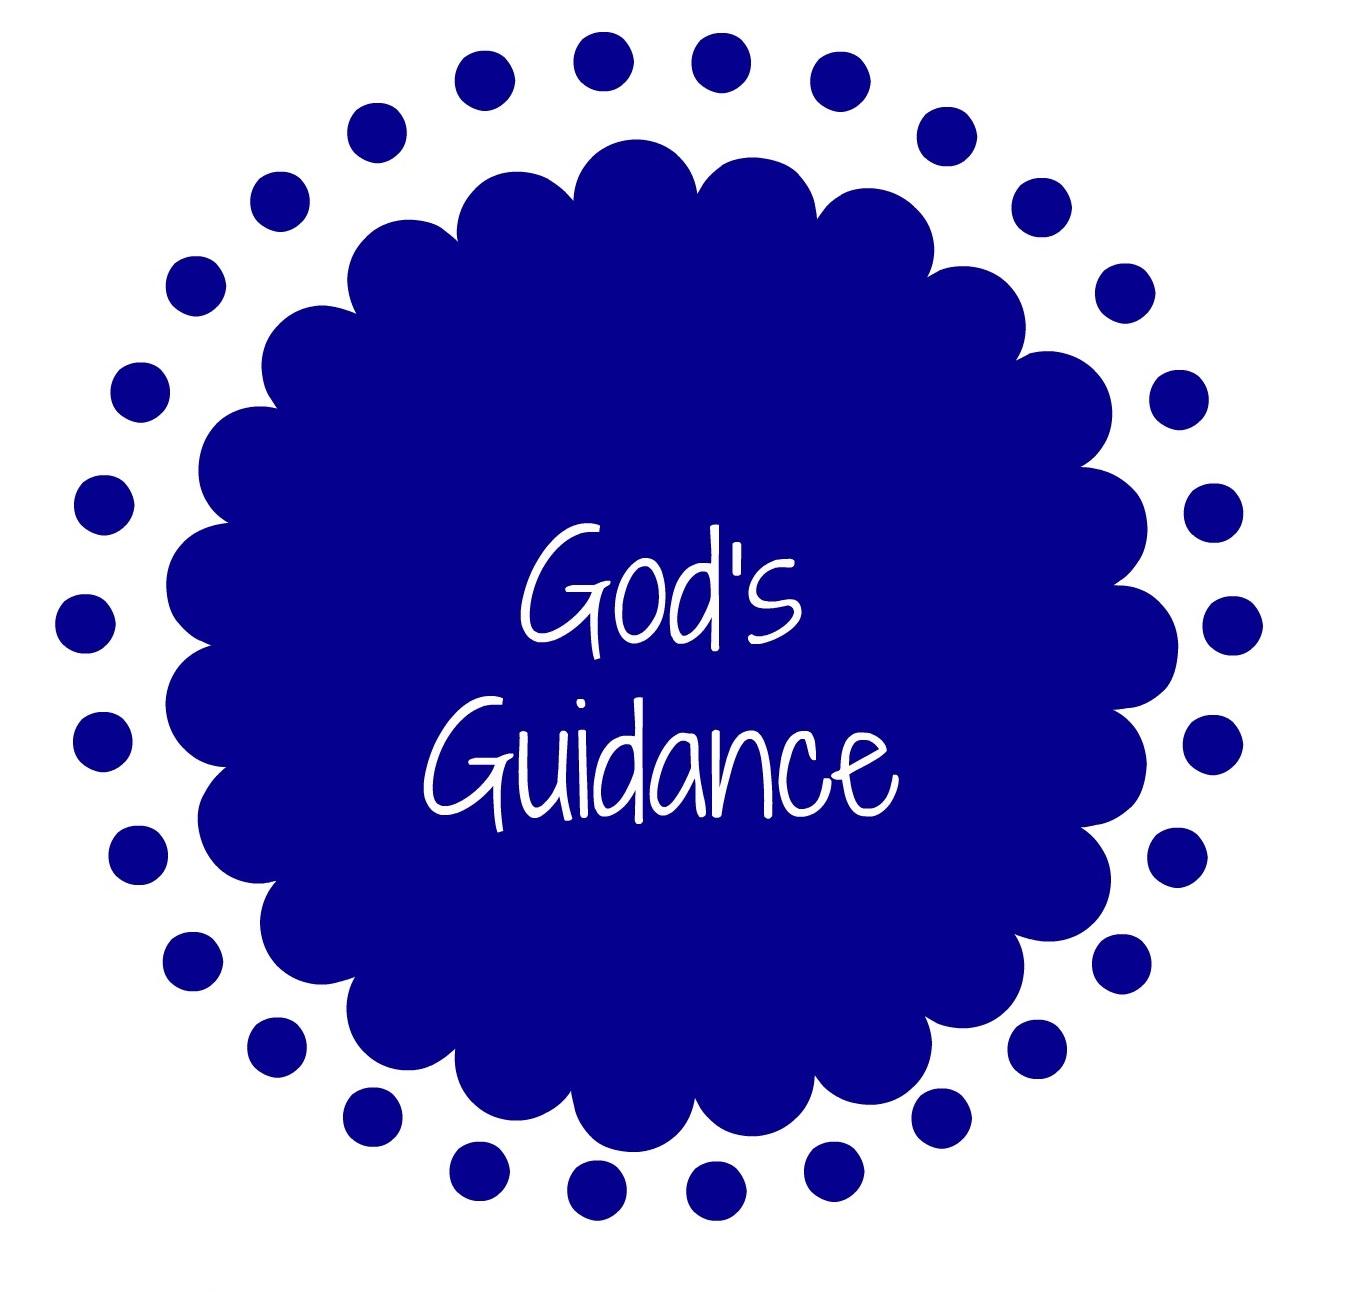 Gods-guidance